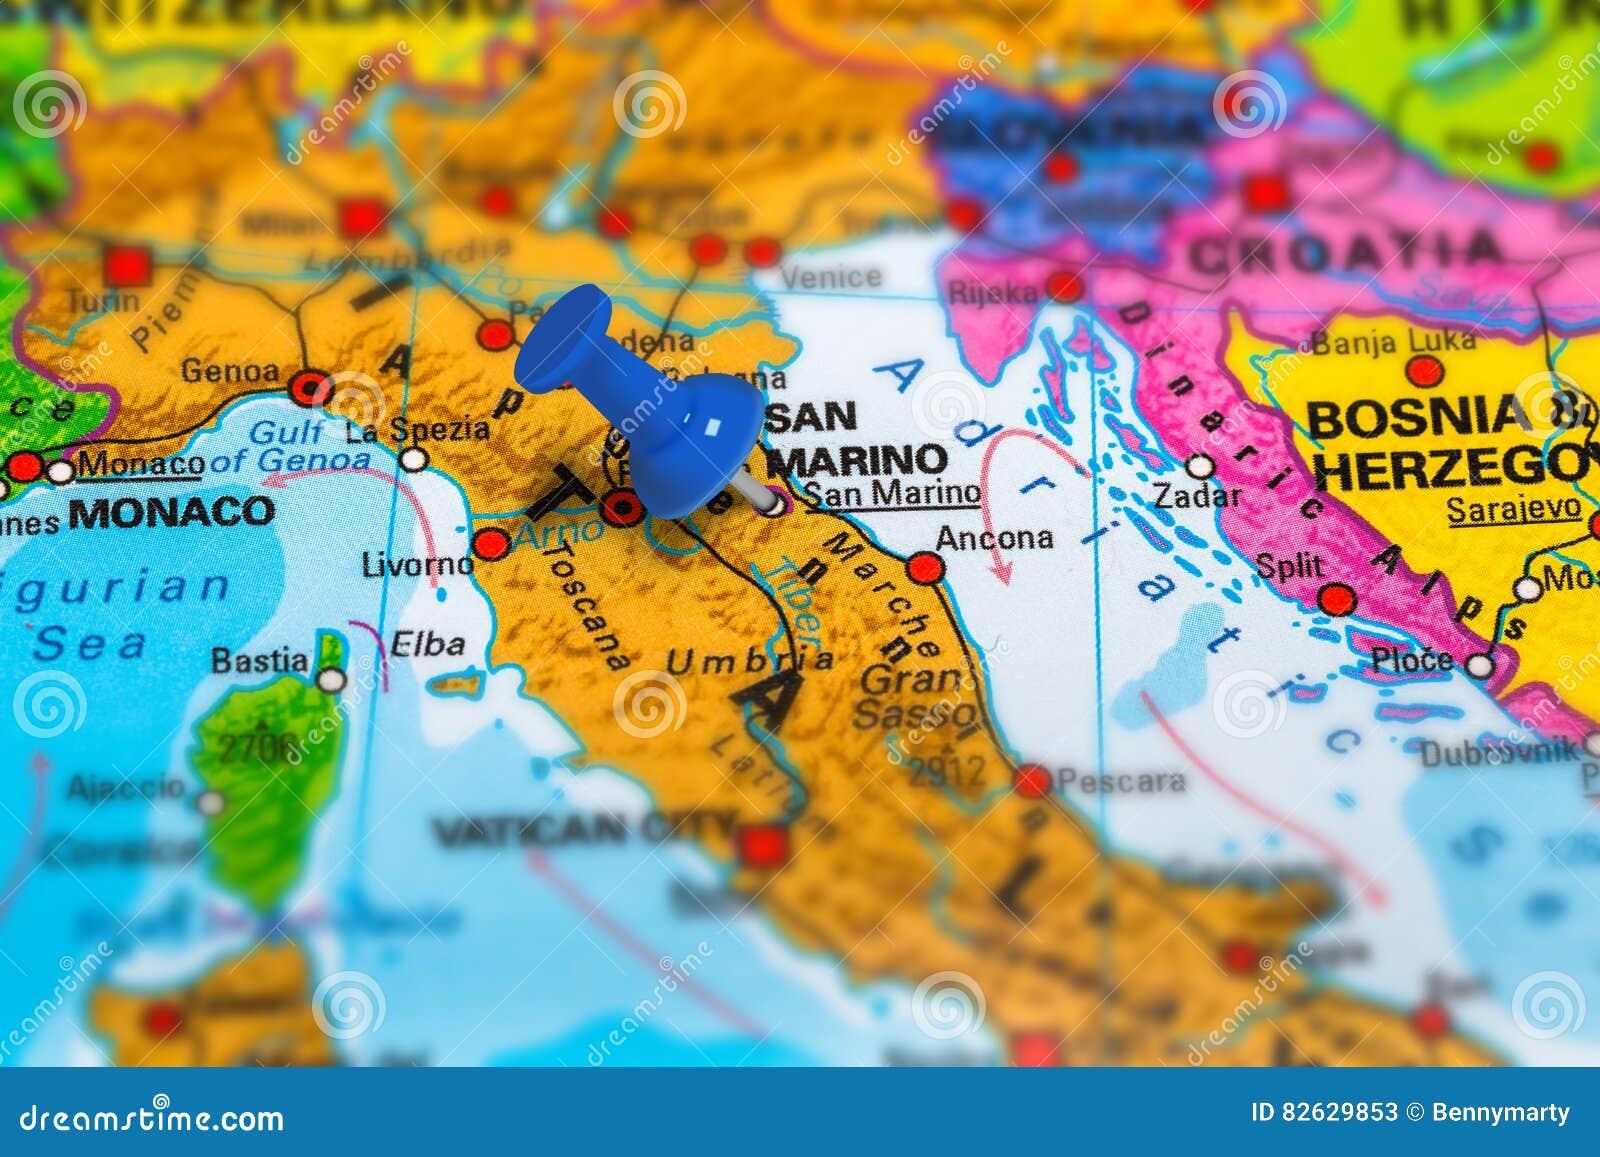 San Marino Mapa Europa.San Marino Wlochy Mapa Obraz Stock Obraz Zlozonej Z Kultura